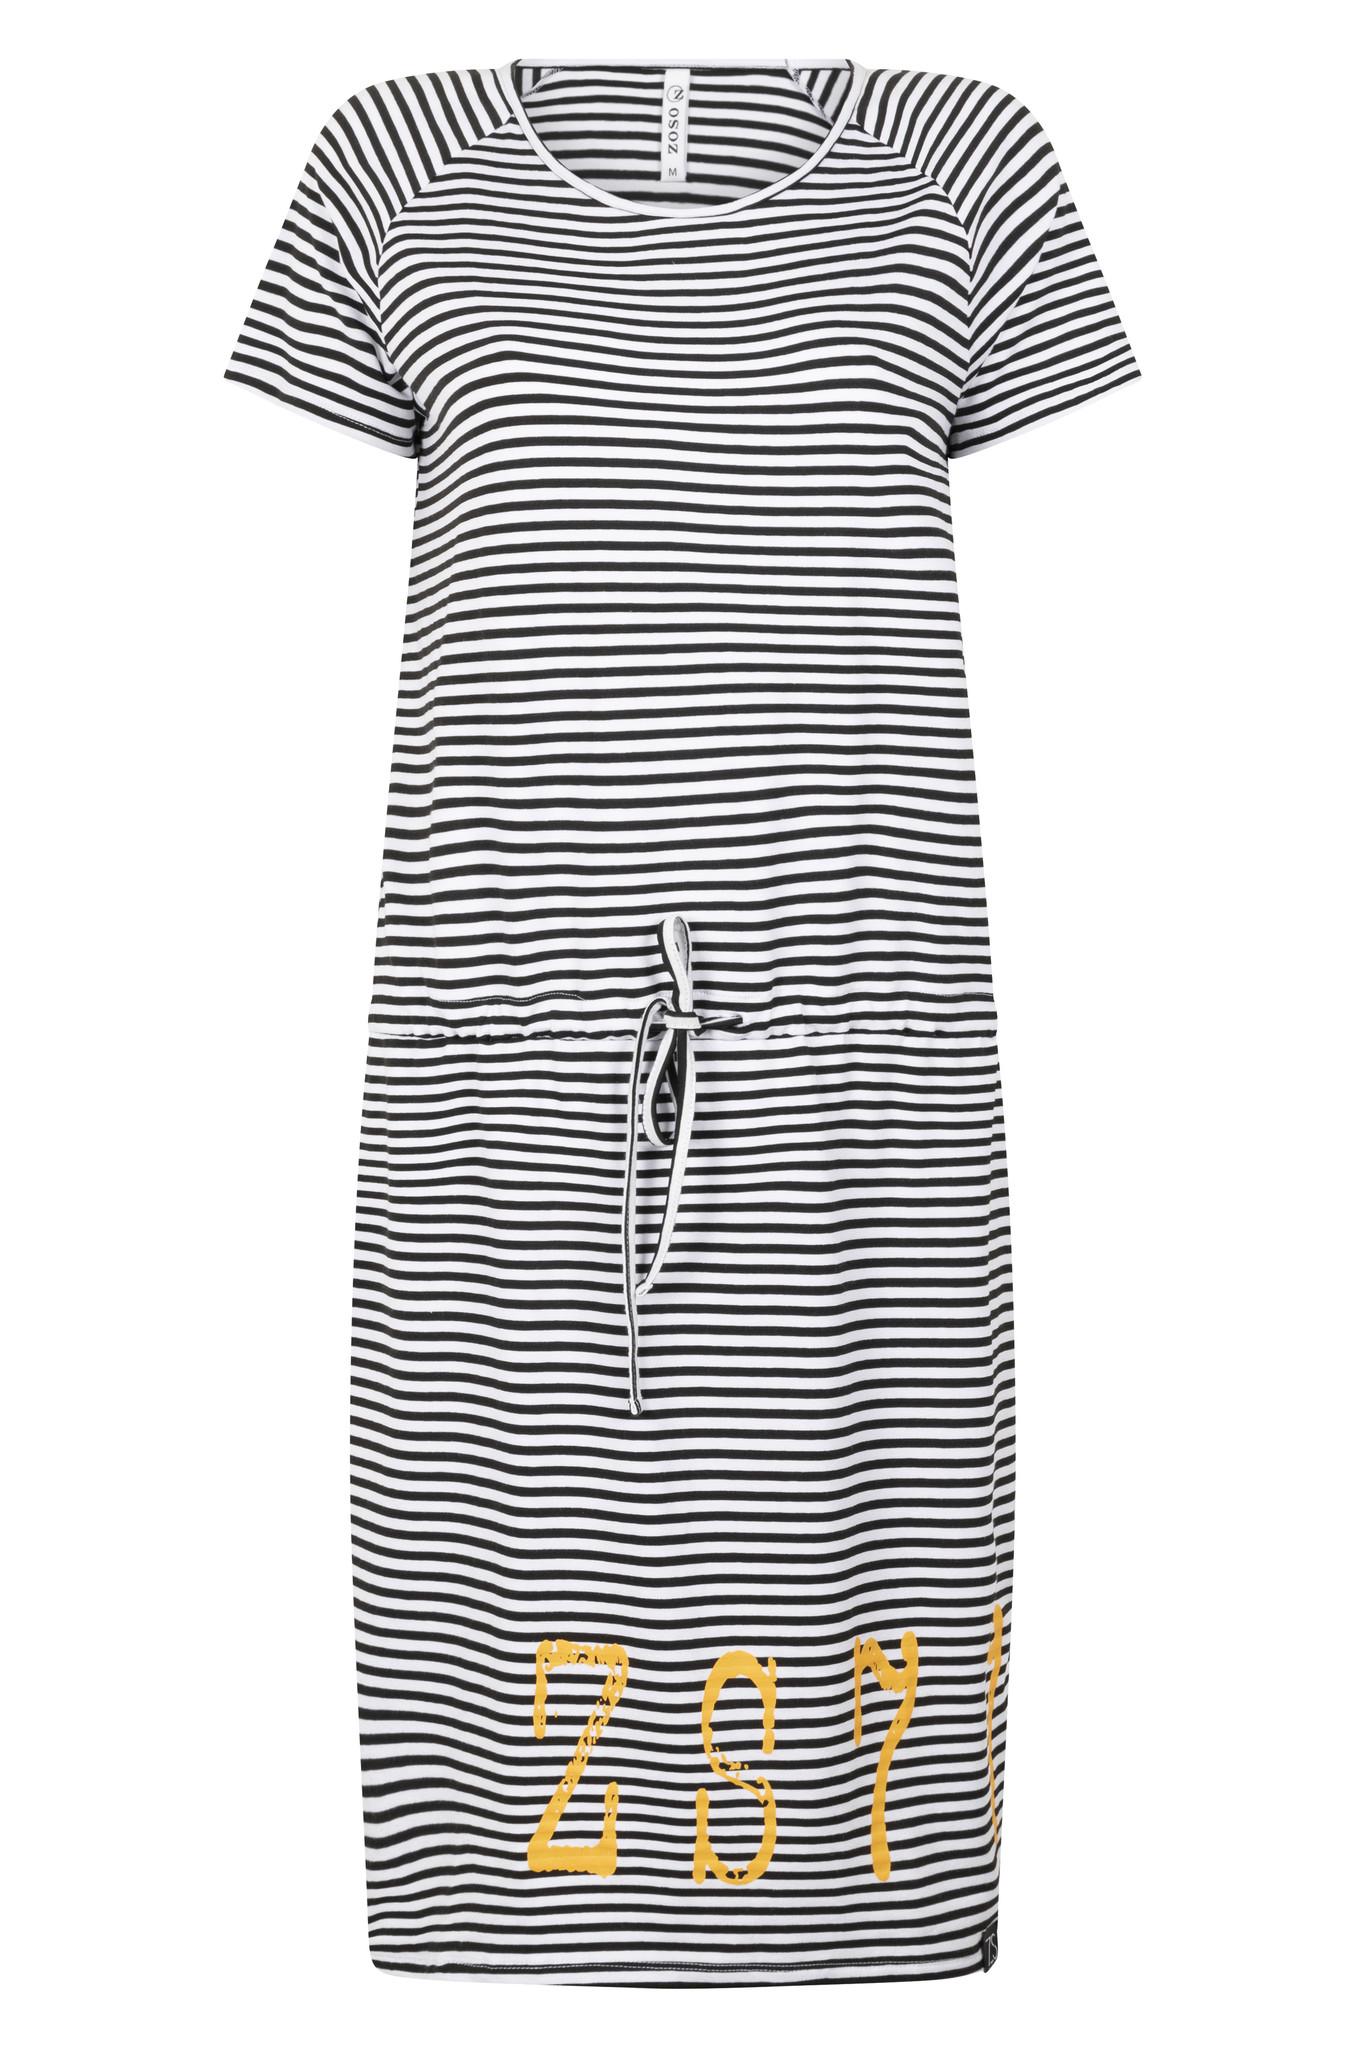 Zoso Zoso Chelsey jurk striped with print